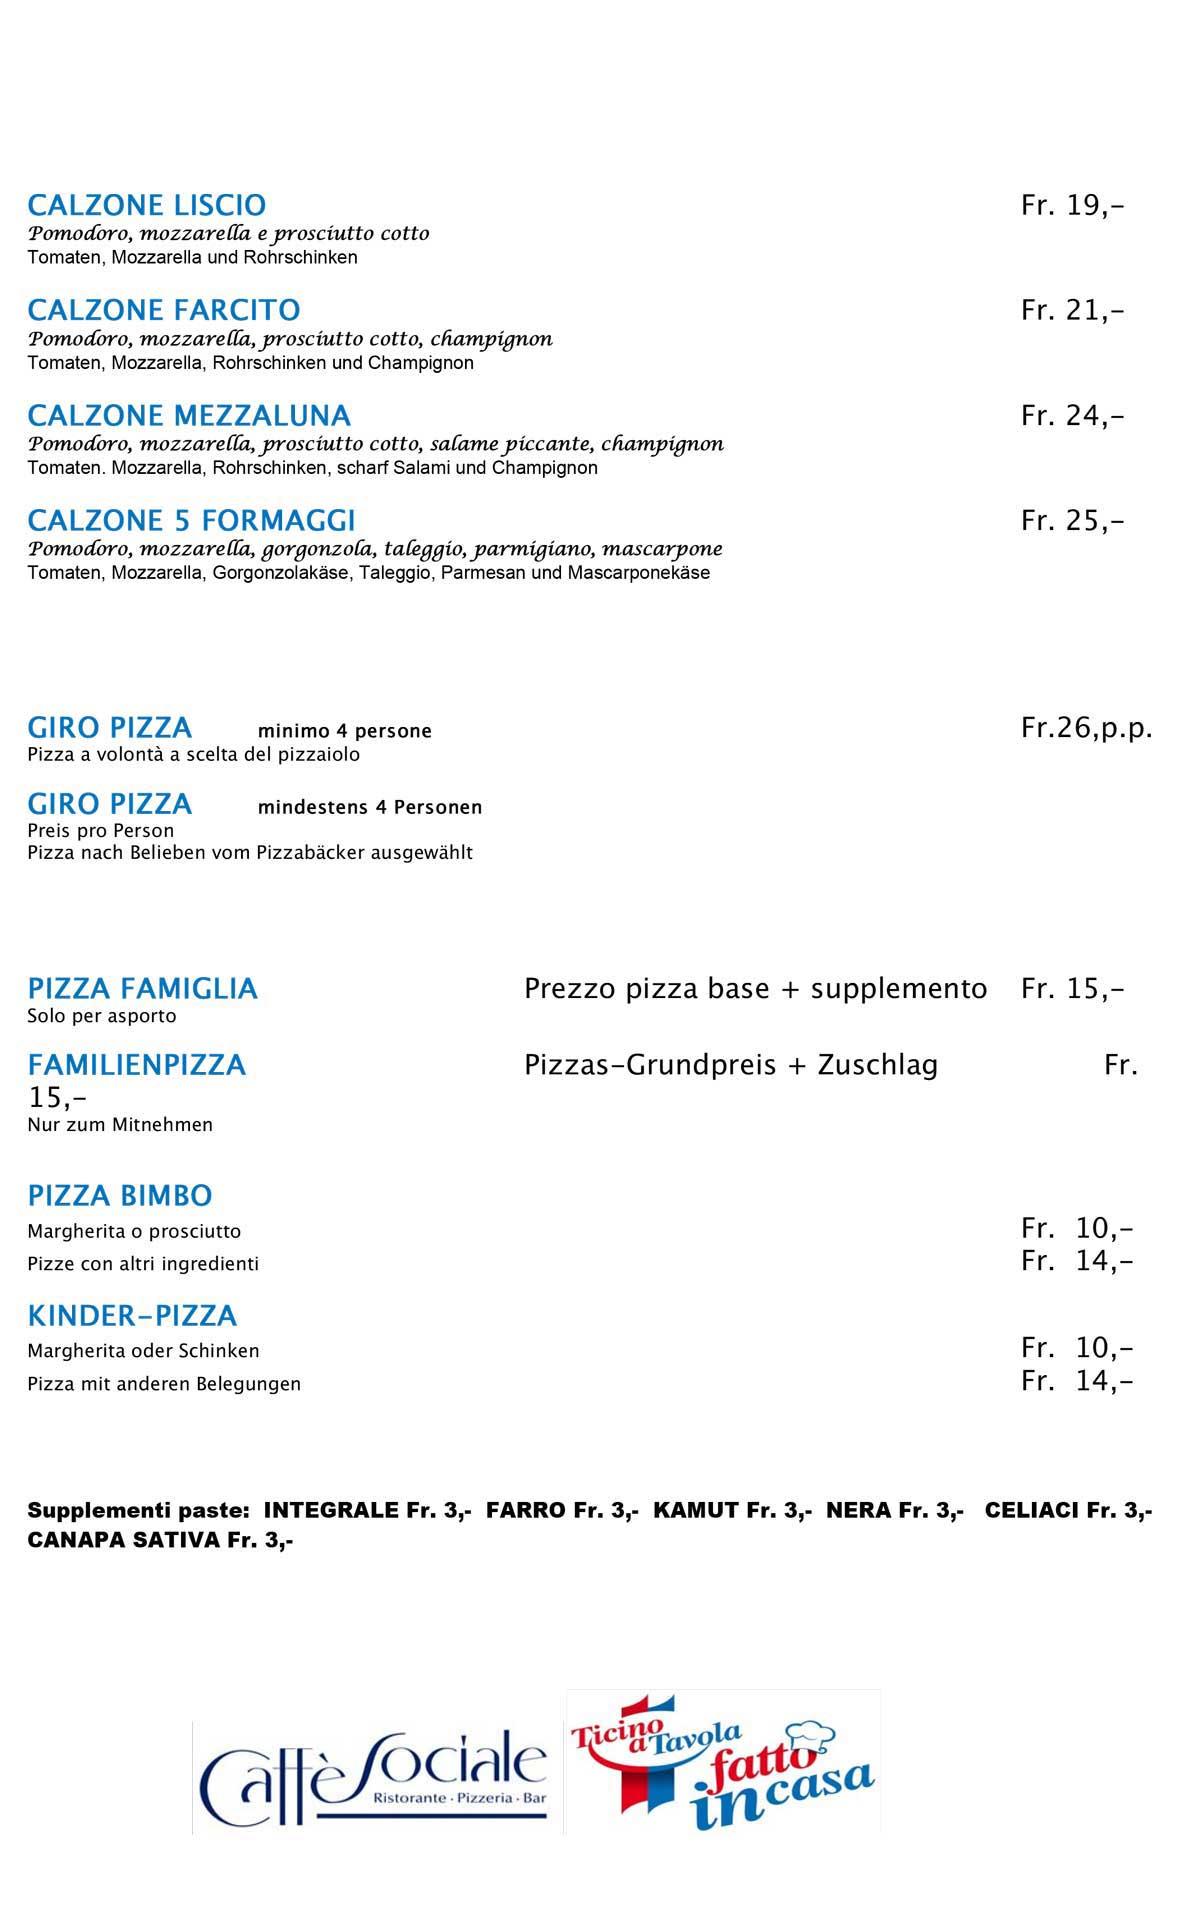 Ristorante Sociale Riva san Vitale menu pizze pag 4